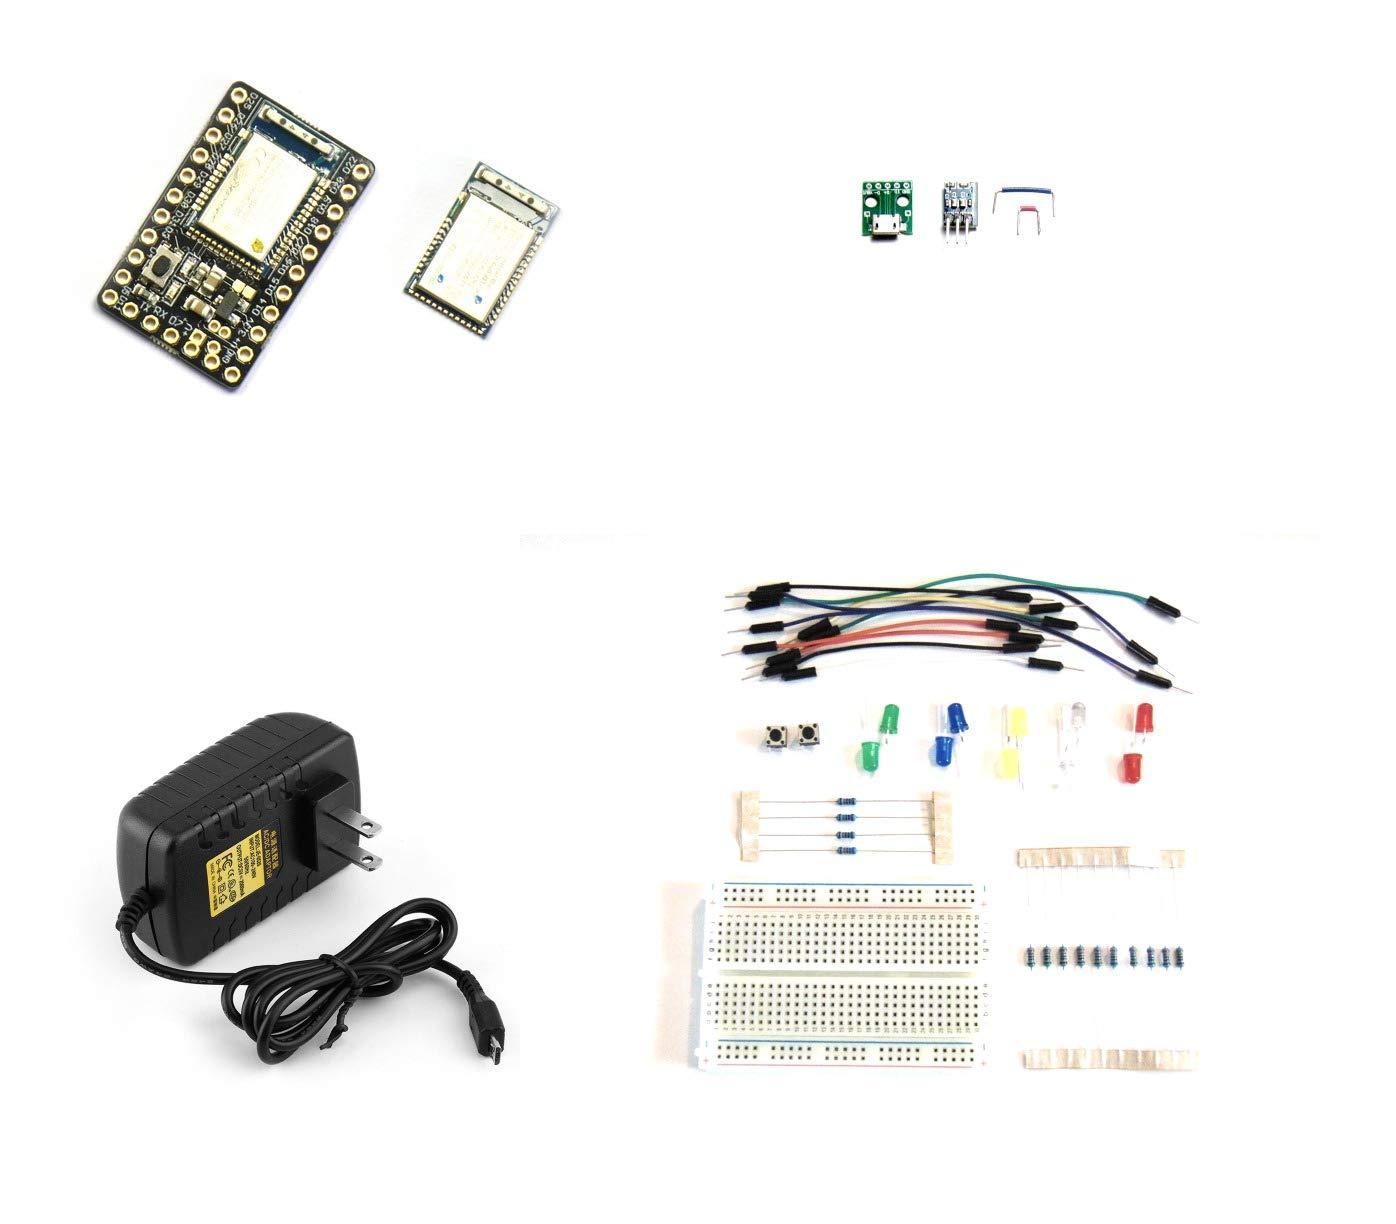 Kit containing one Espruino MDBT42Q Breakout and one KitsBitsnBytes USB Power Breadboard KM-EMDBTBB007